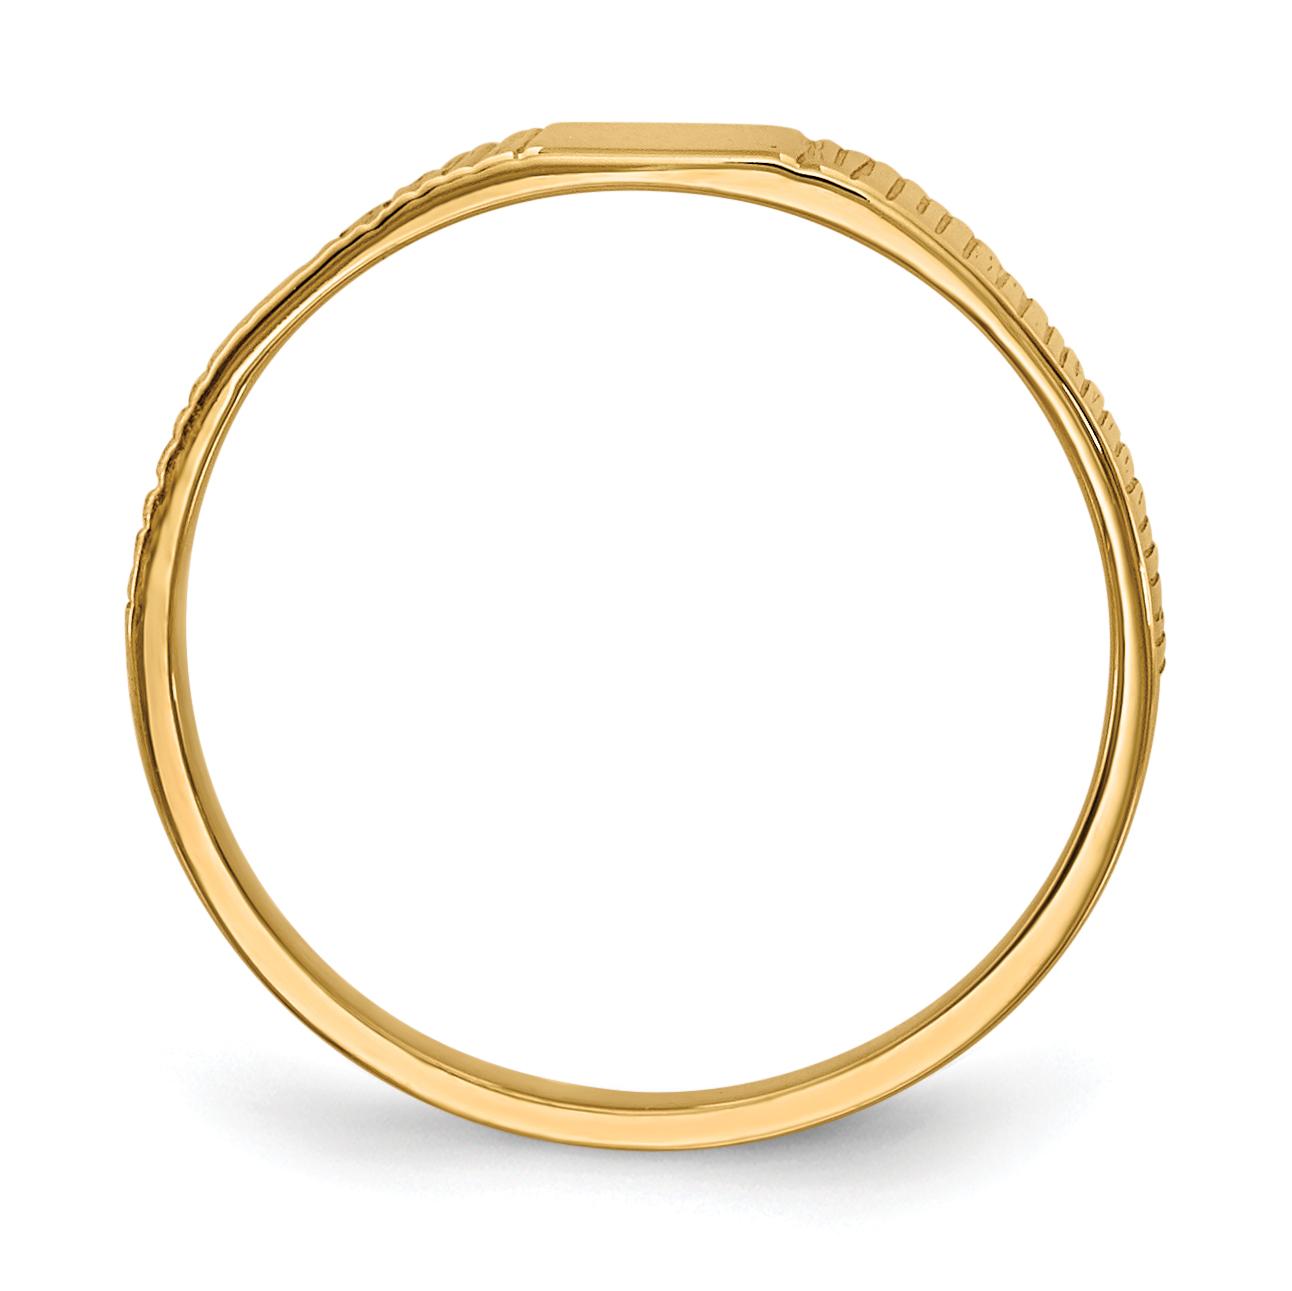 14K Yellow Gold Polished & Ridged Baby Ring - image 4 of 5